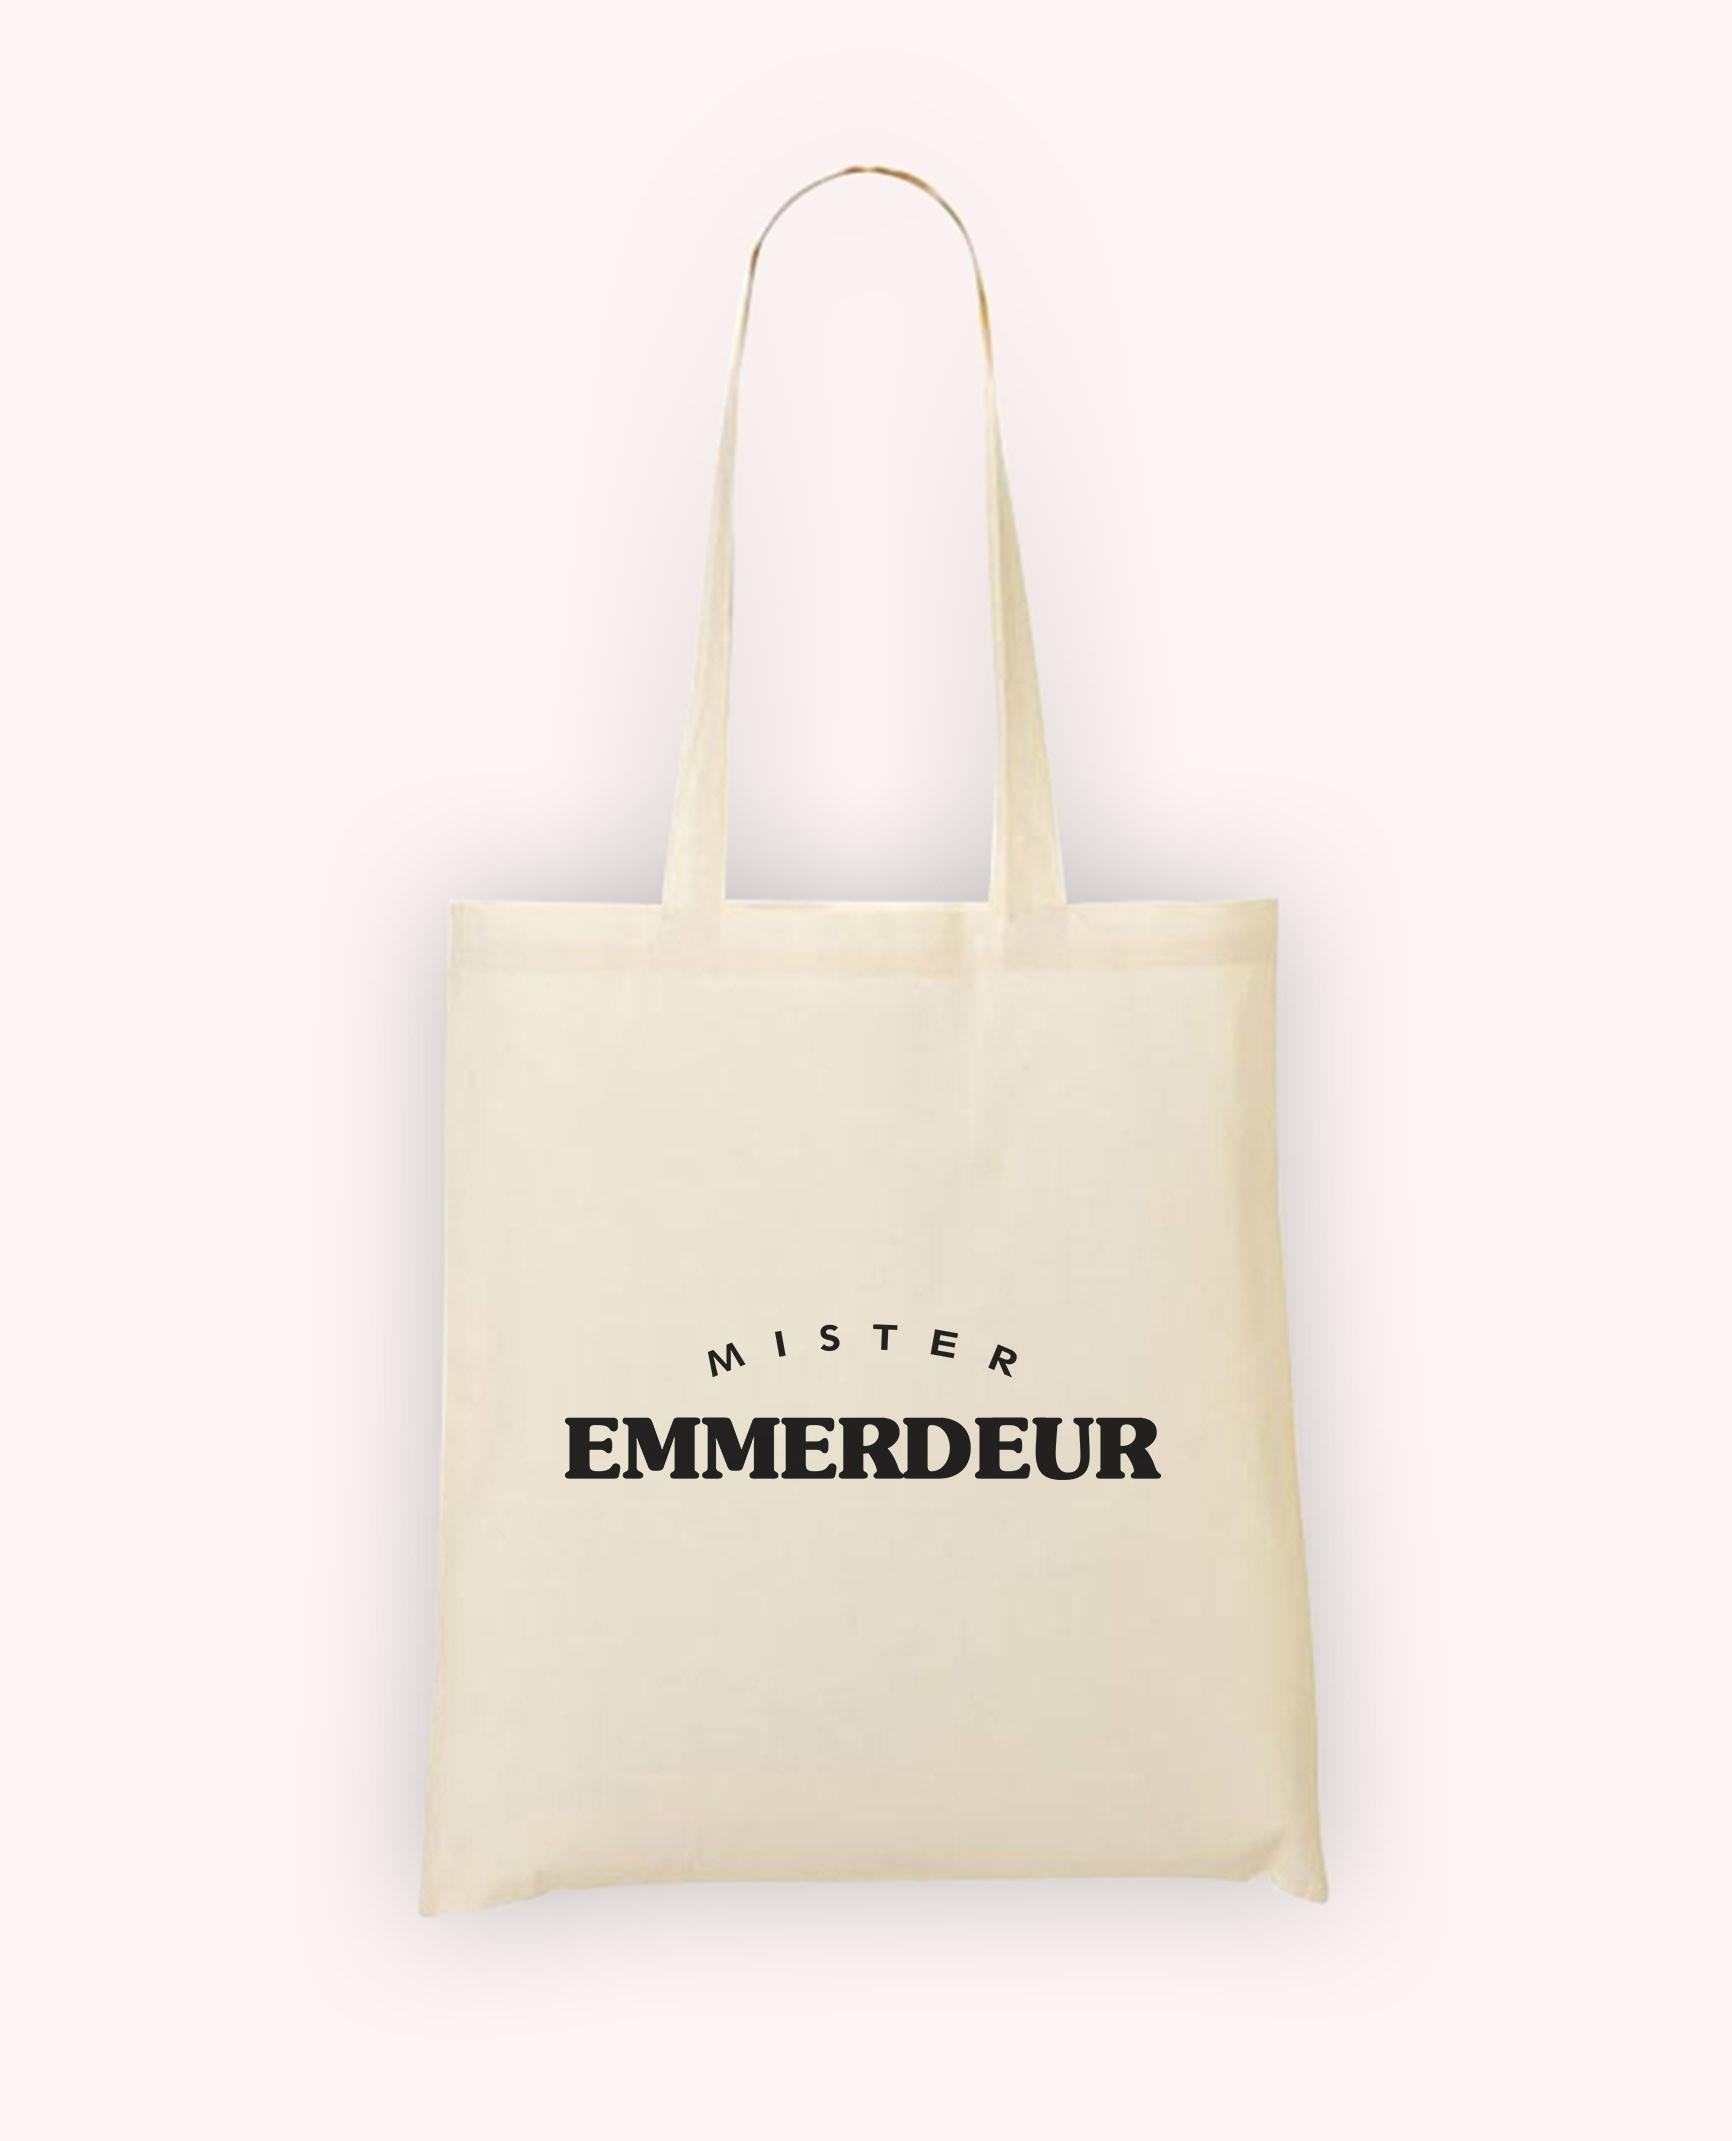 Totebag Mister Emmerdeur